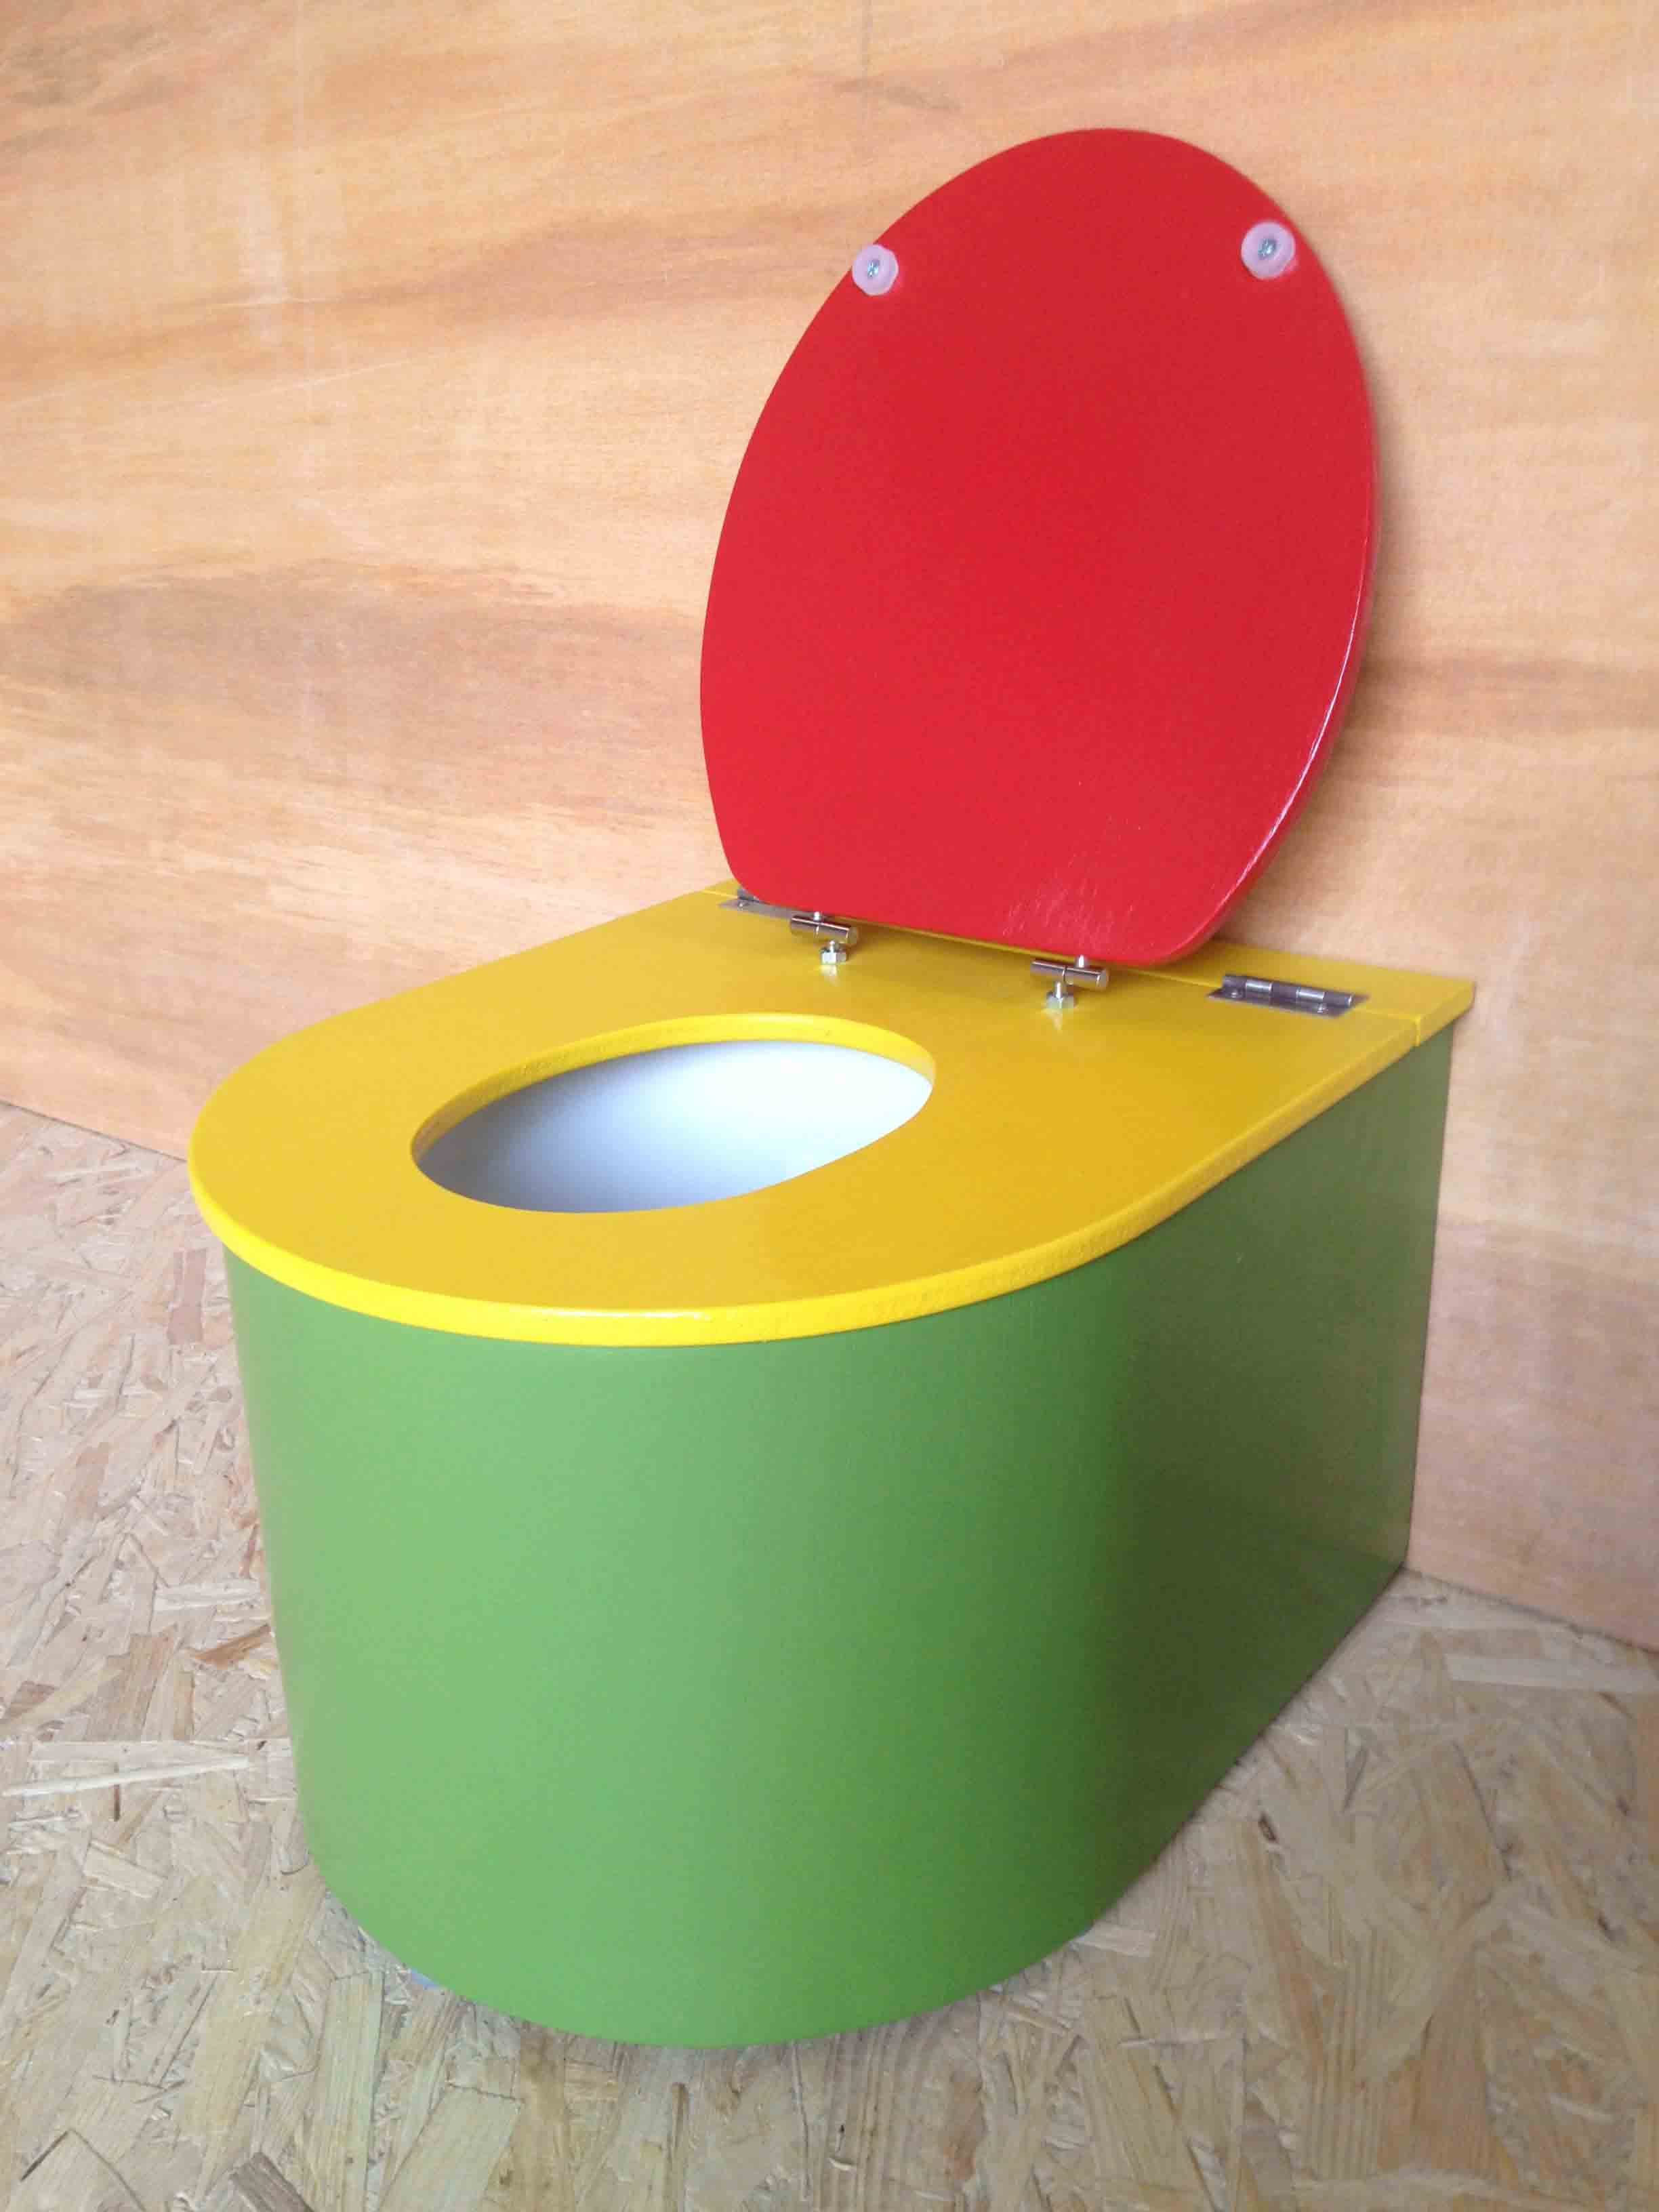 mini toilette bebe vert jaune rouge